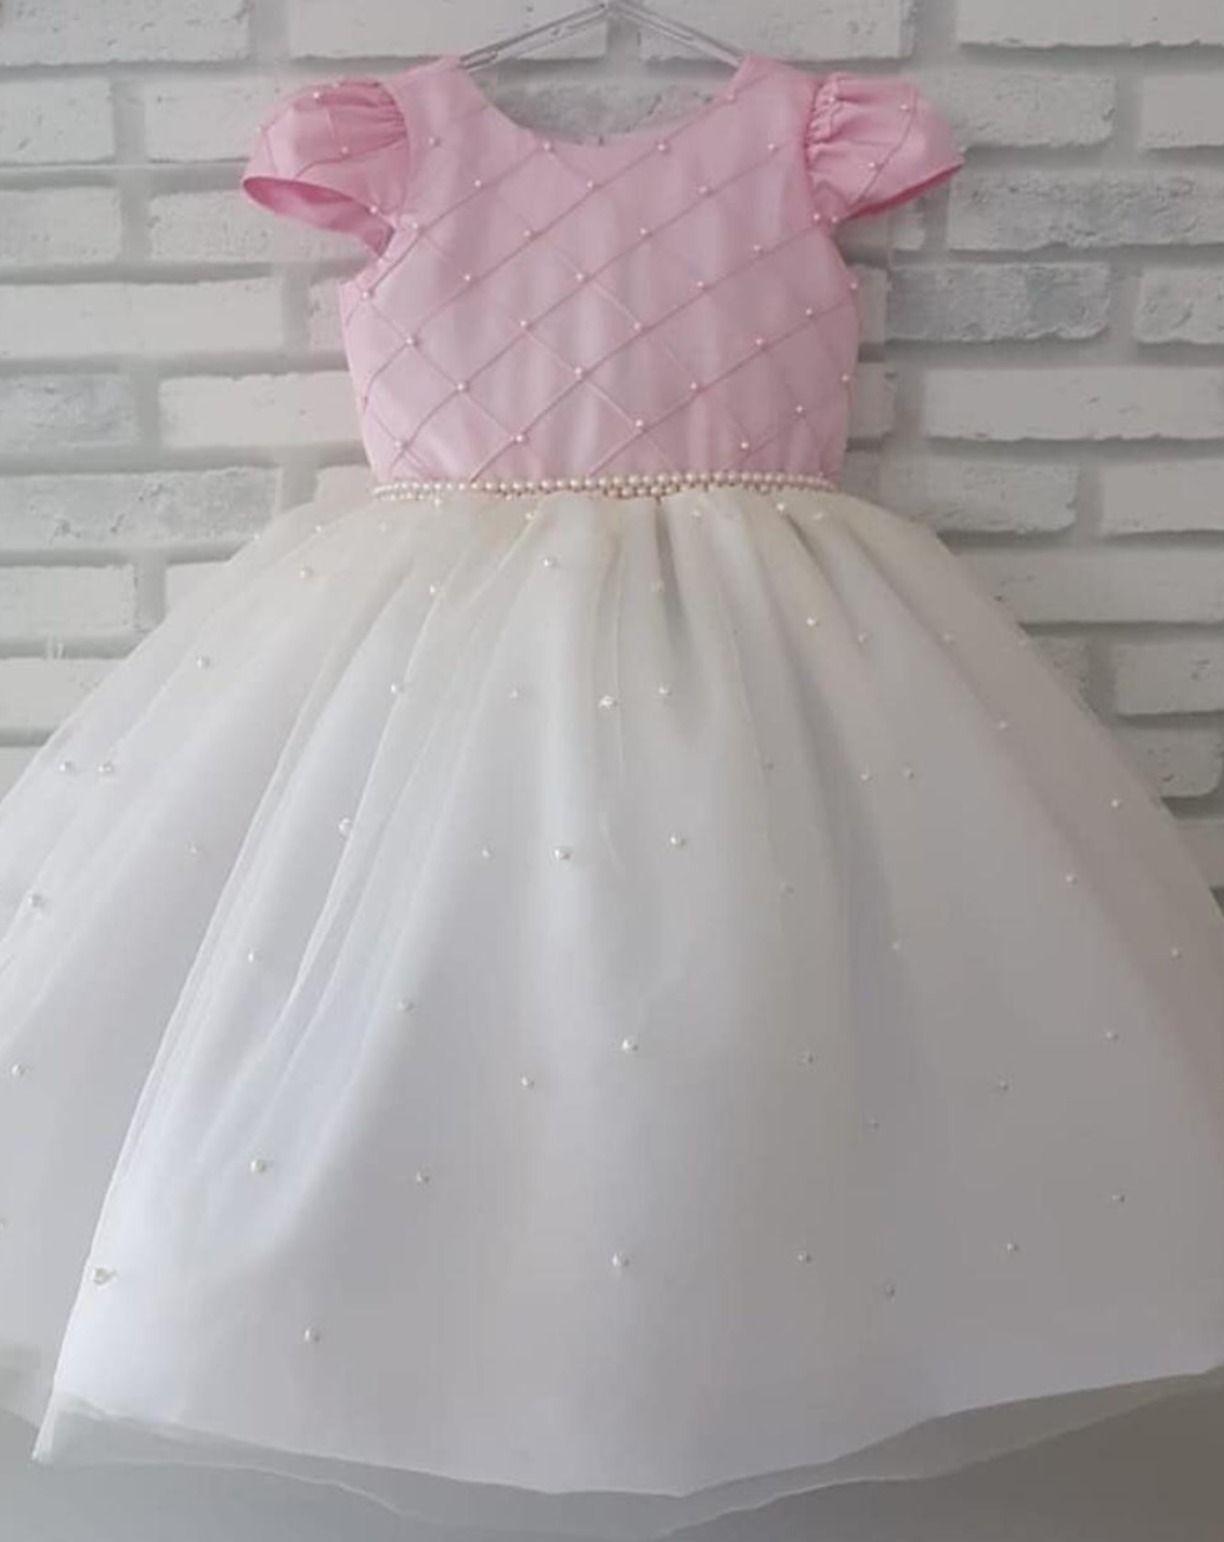 Children Dresses Birthday Dresses Flowergirl Dresses Children Clothing Couture Dresses Fashion Dr In 2020 Dresses Little Girl Dresses Beaded Dress